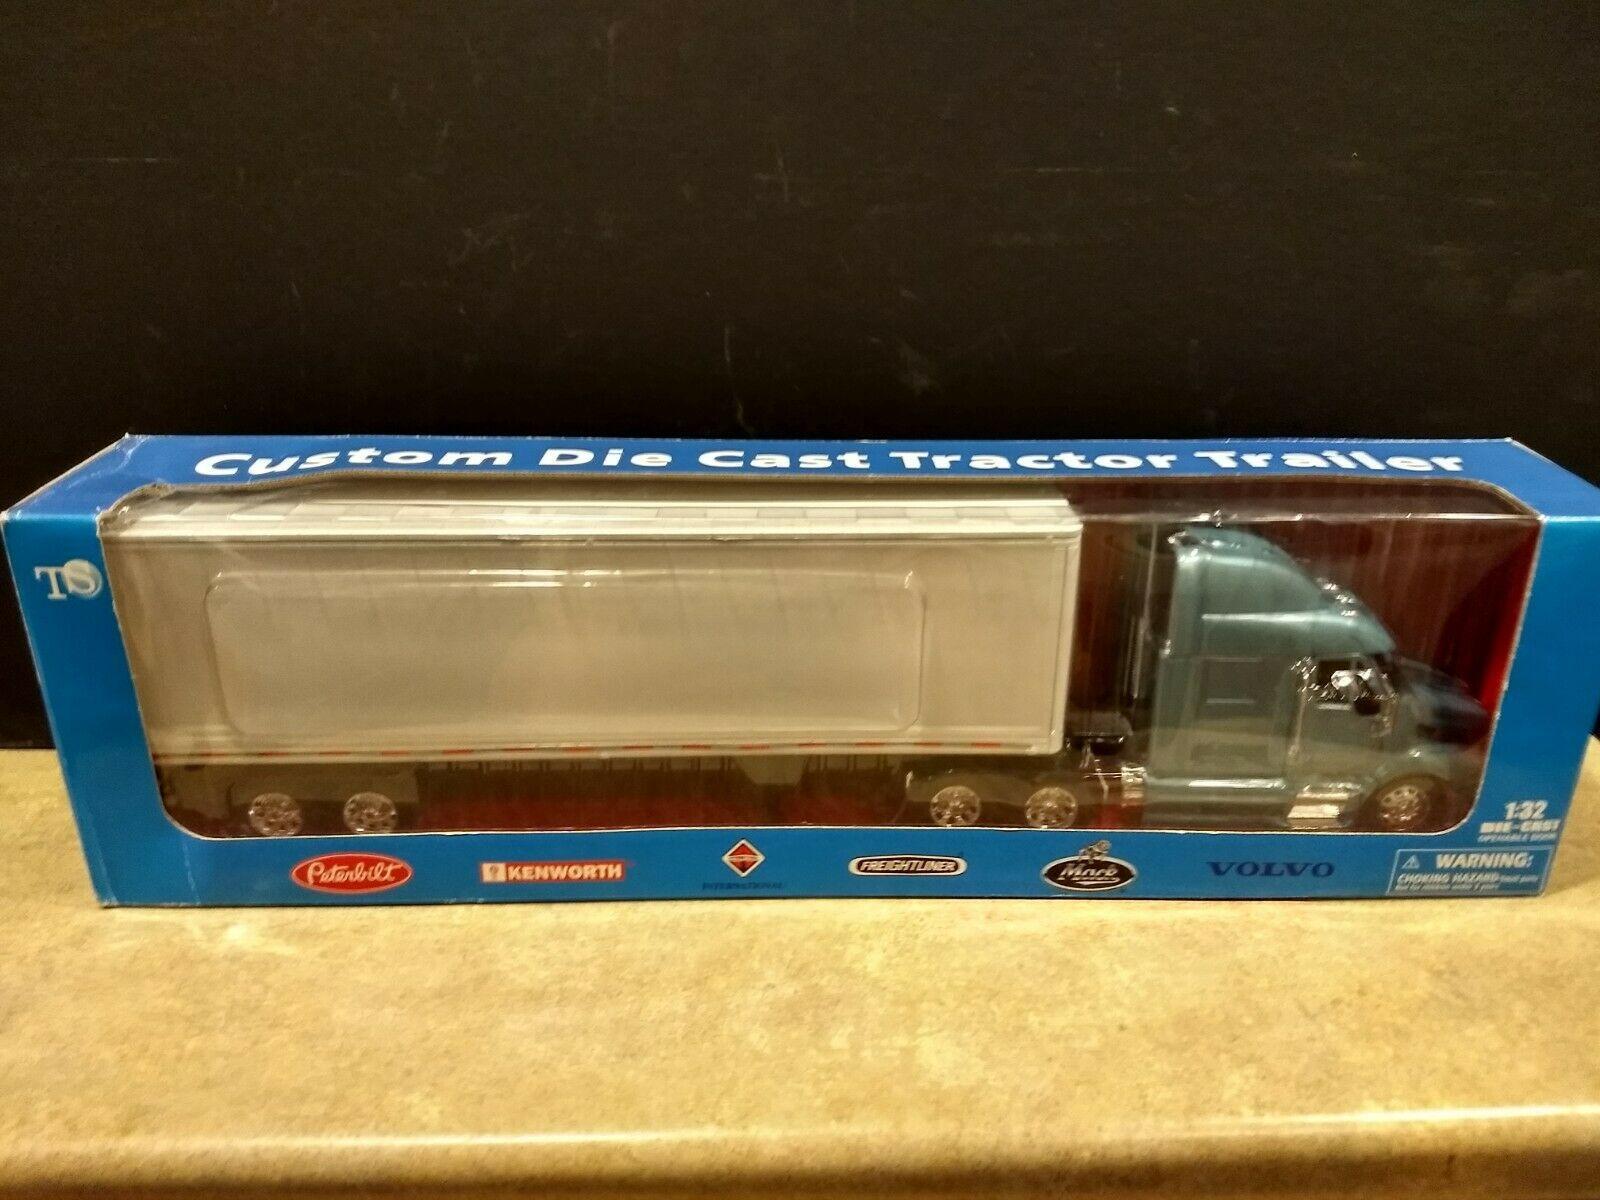 Kenworth Freightliner New Ray Die Cast Scale 1 32 New In Unopened Box Freightliner Freightliner Classic Diecast